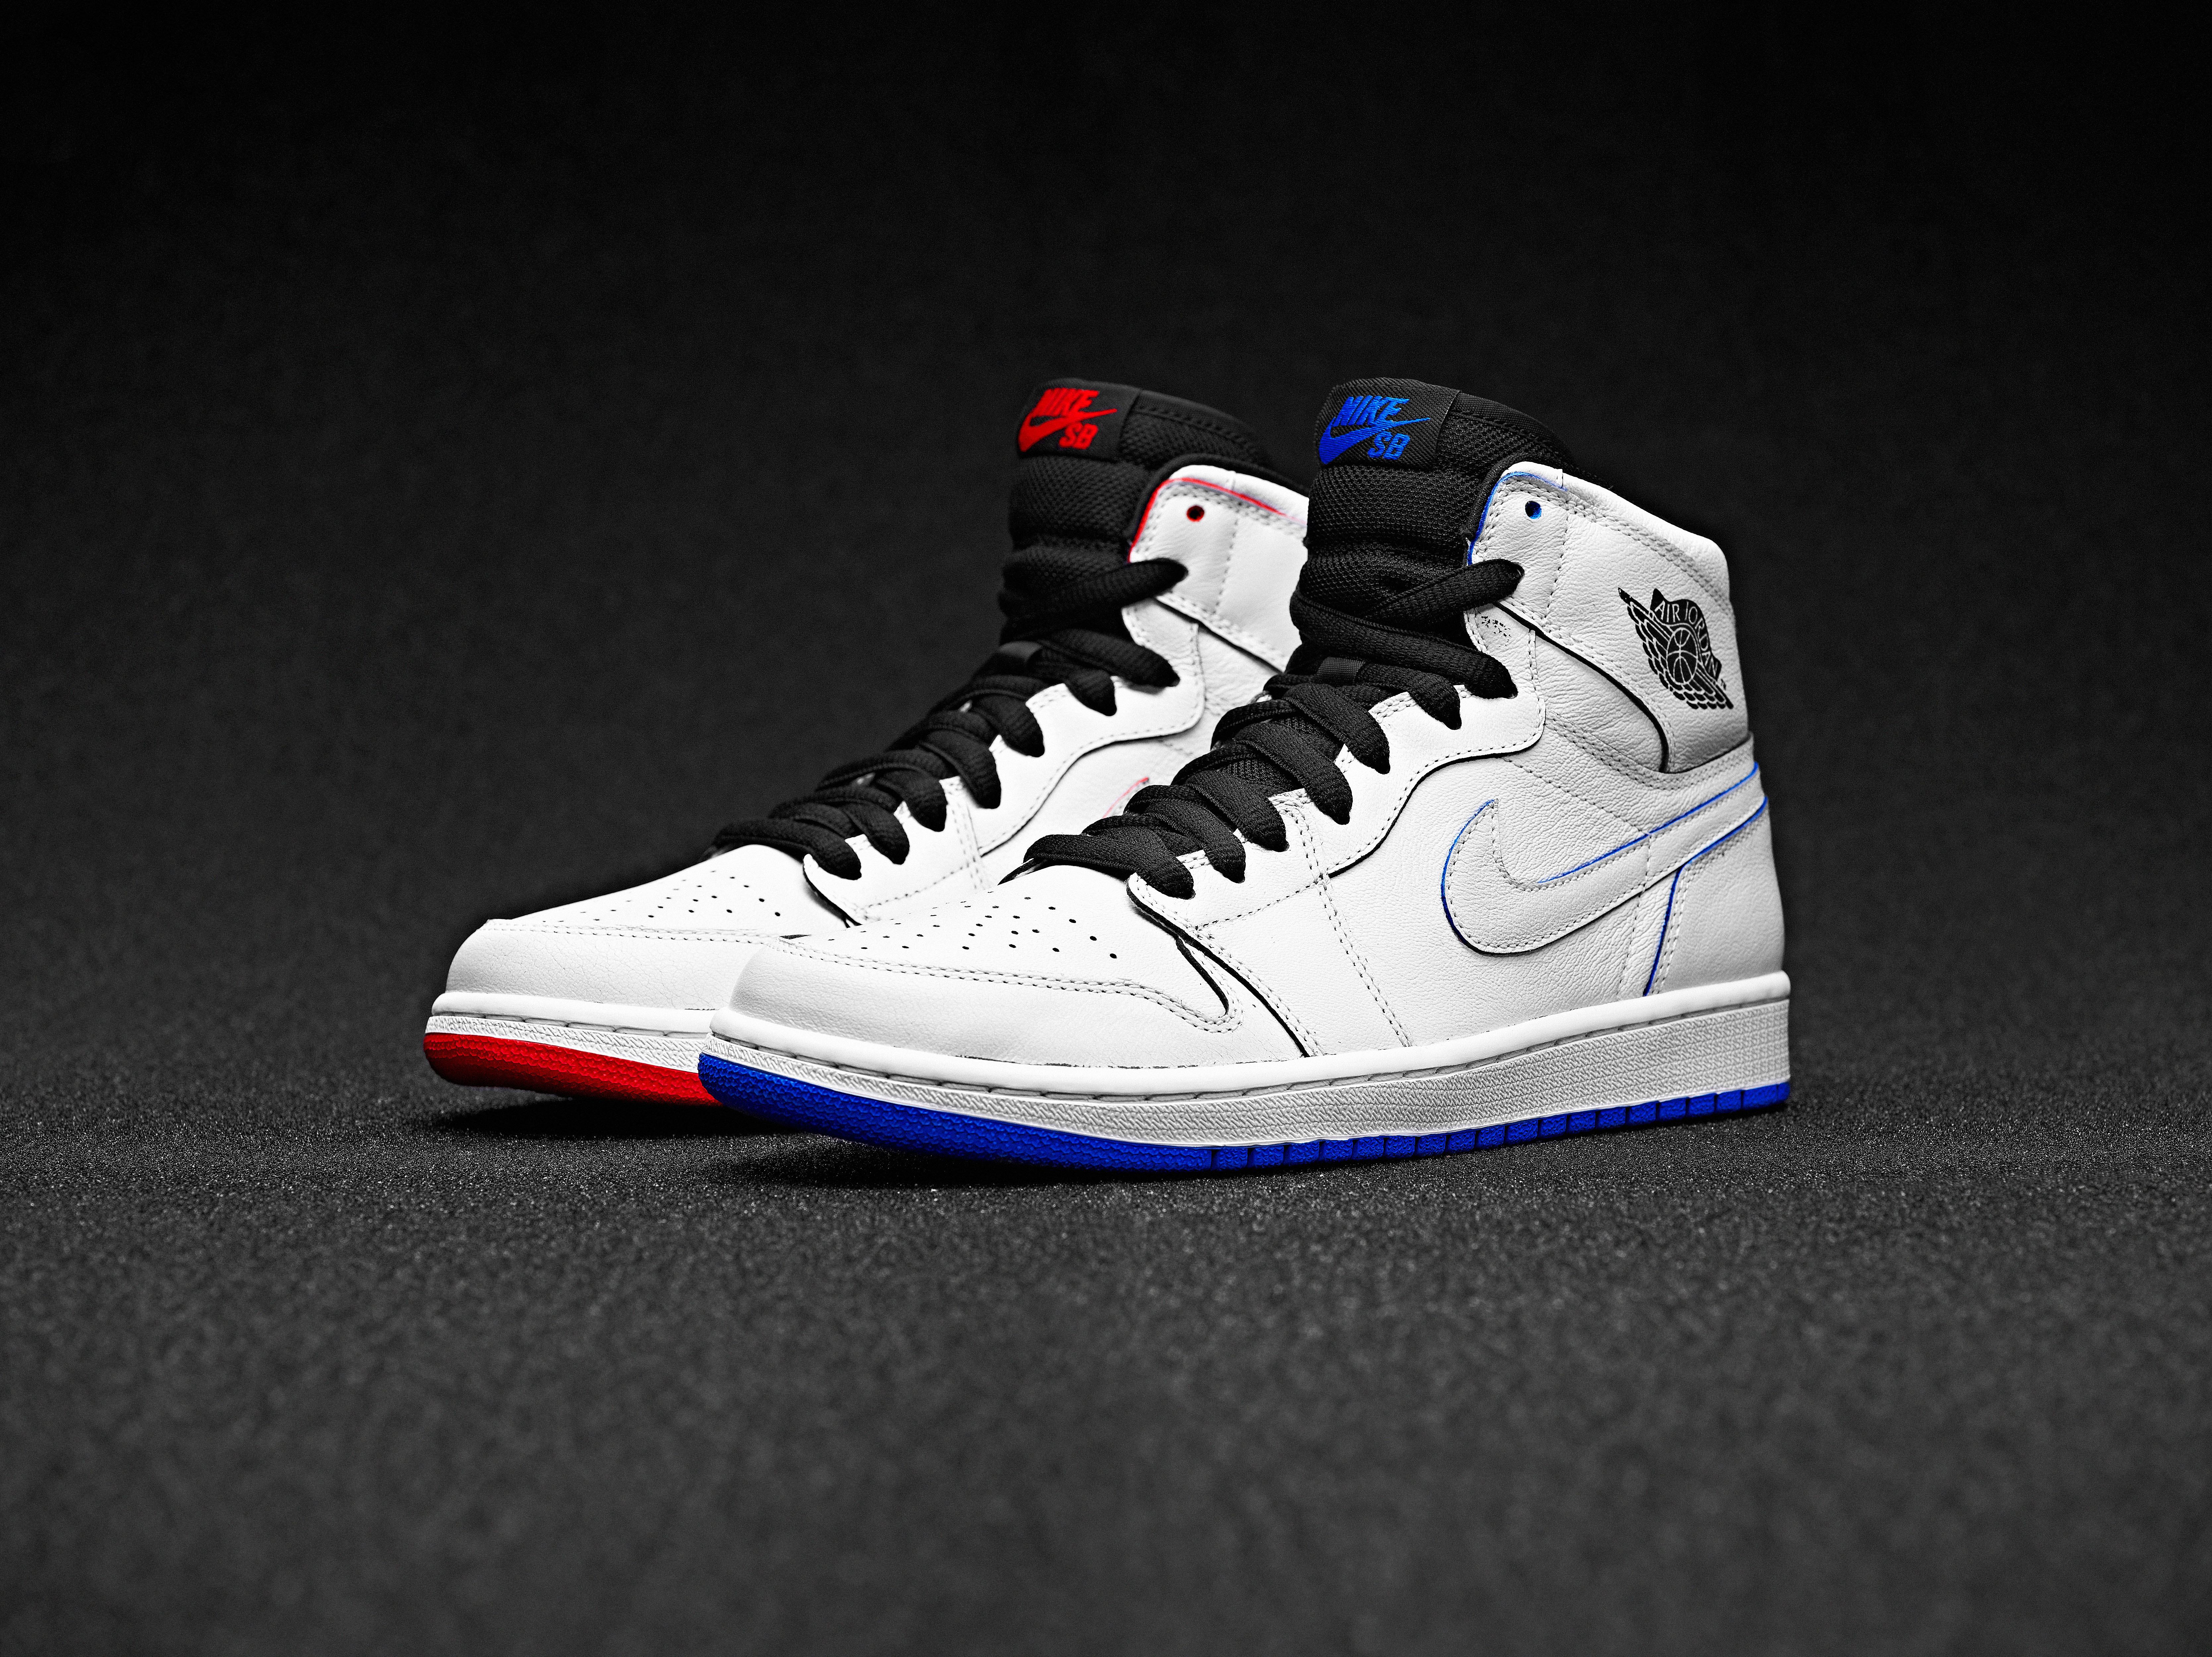 grey and white nike tennis shoes original air jordan shoes